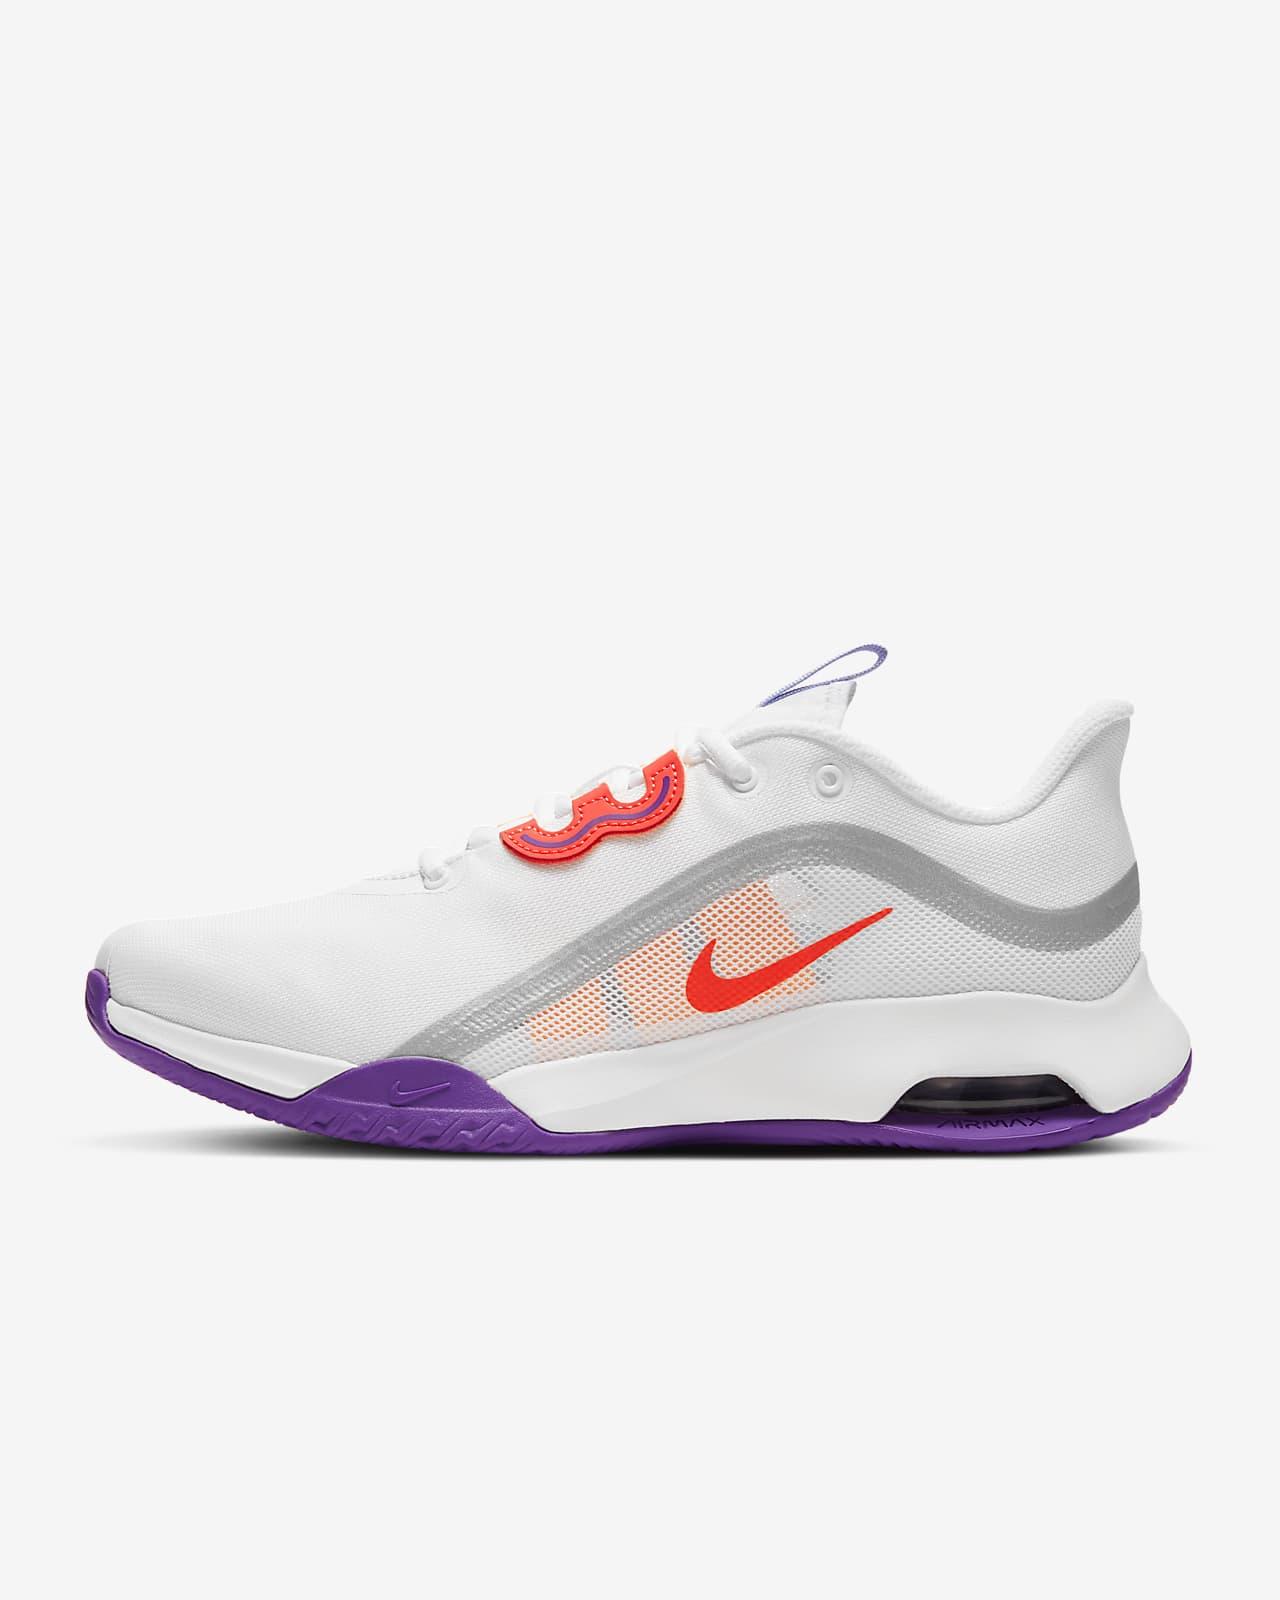 NikeCourt Air Max Volley Women's Hard-Court Tennis Shoe